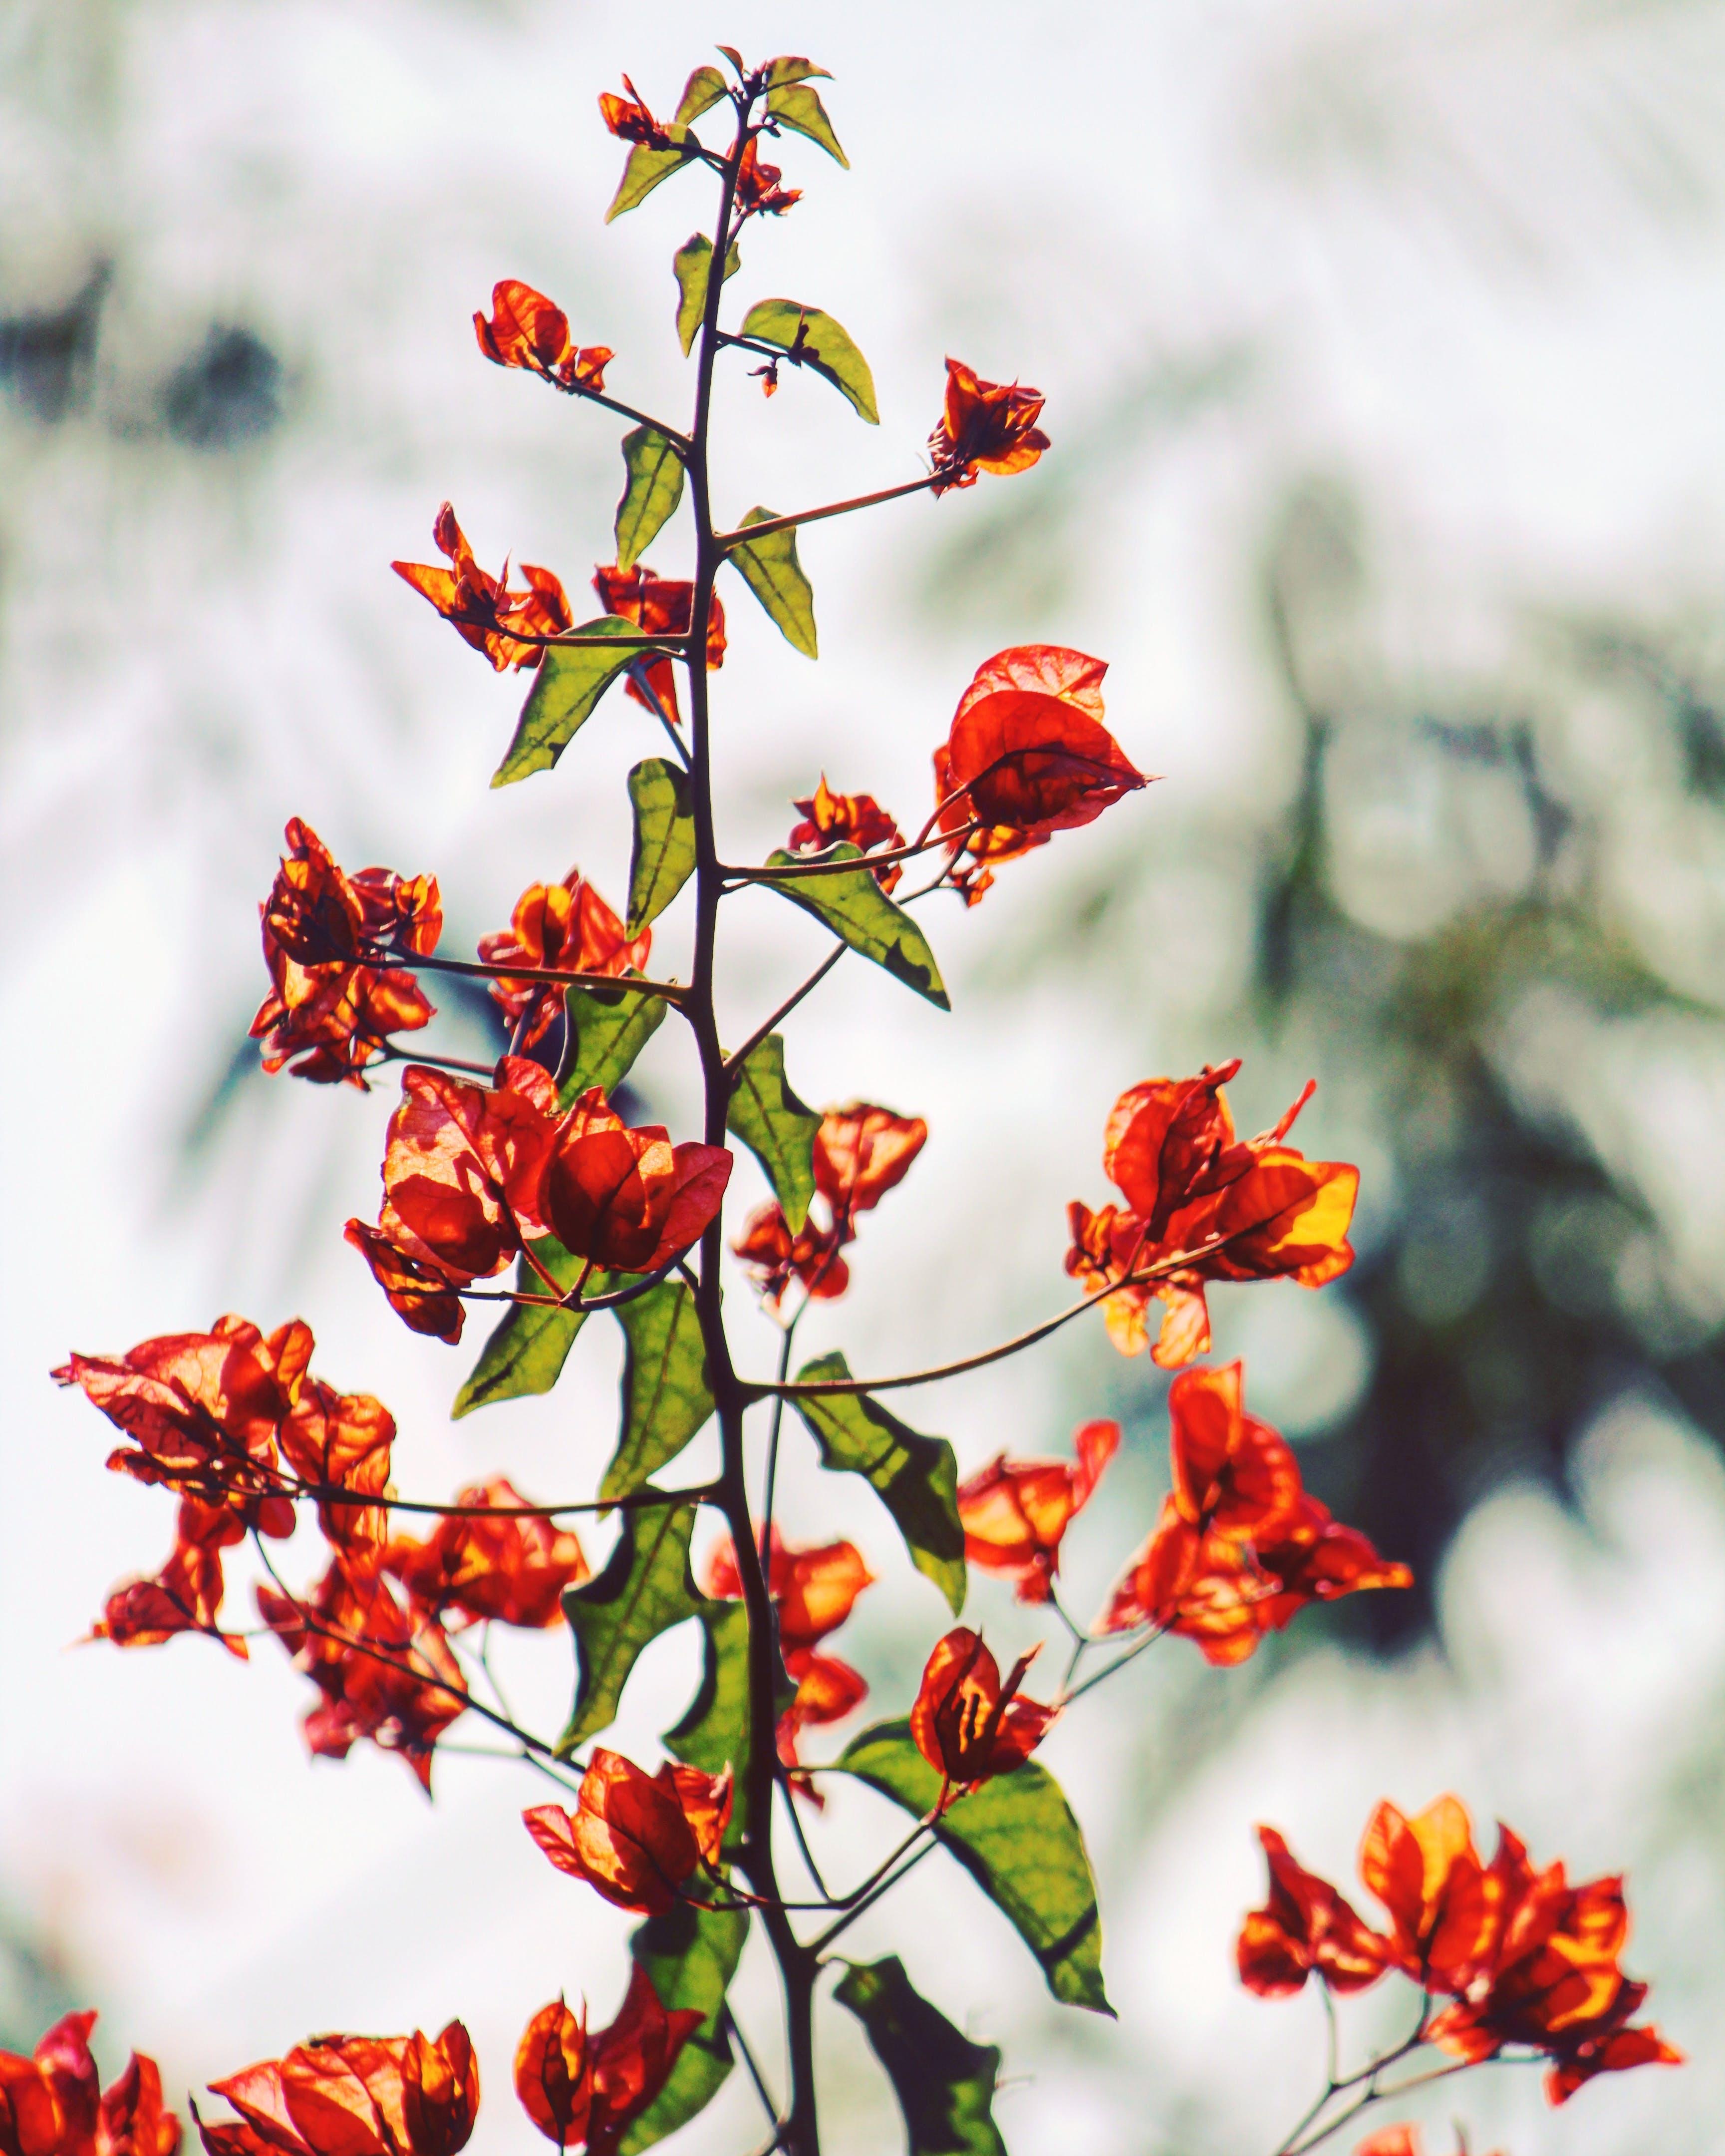 Orange Bougainvillea Flowers in Selective Focus Photography